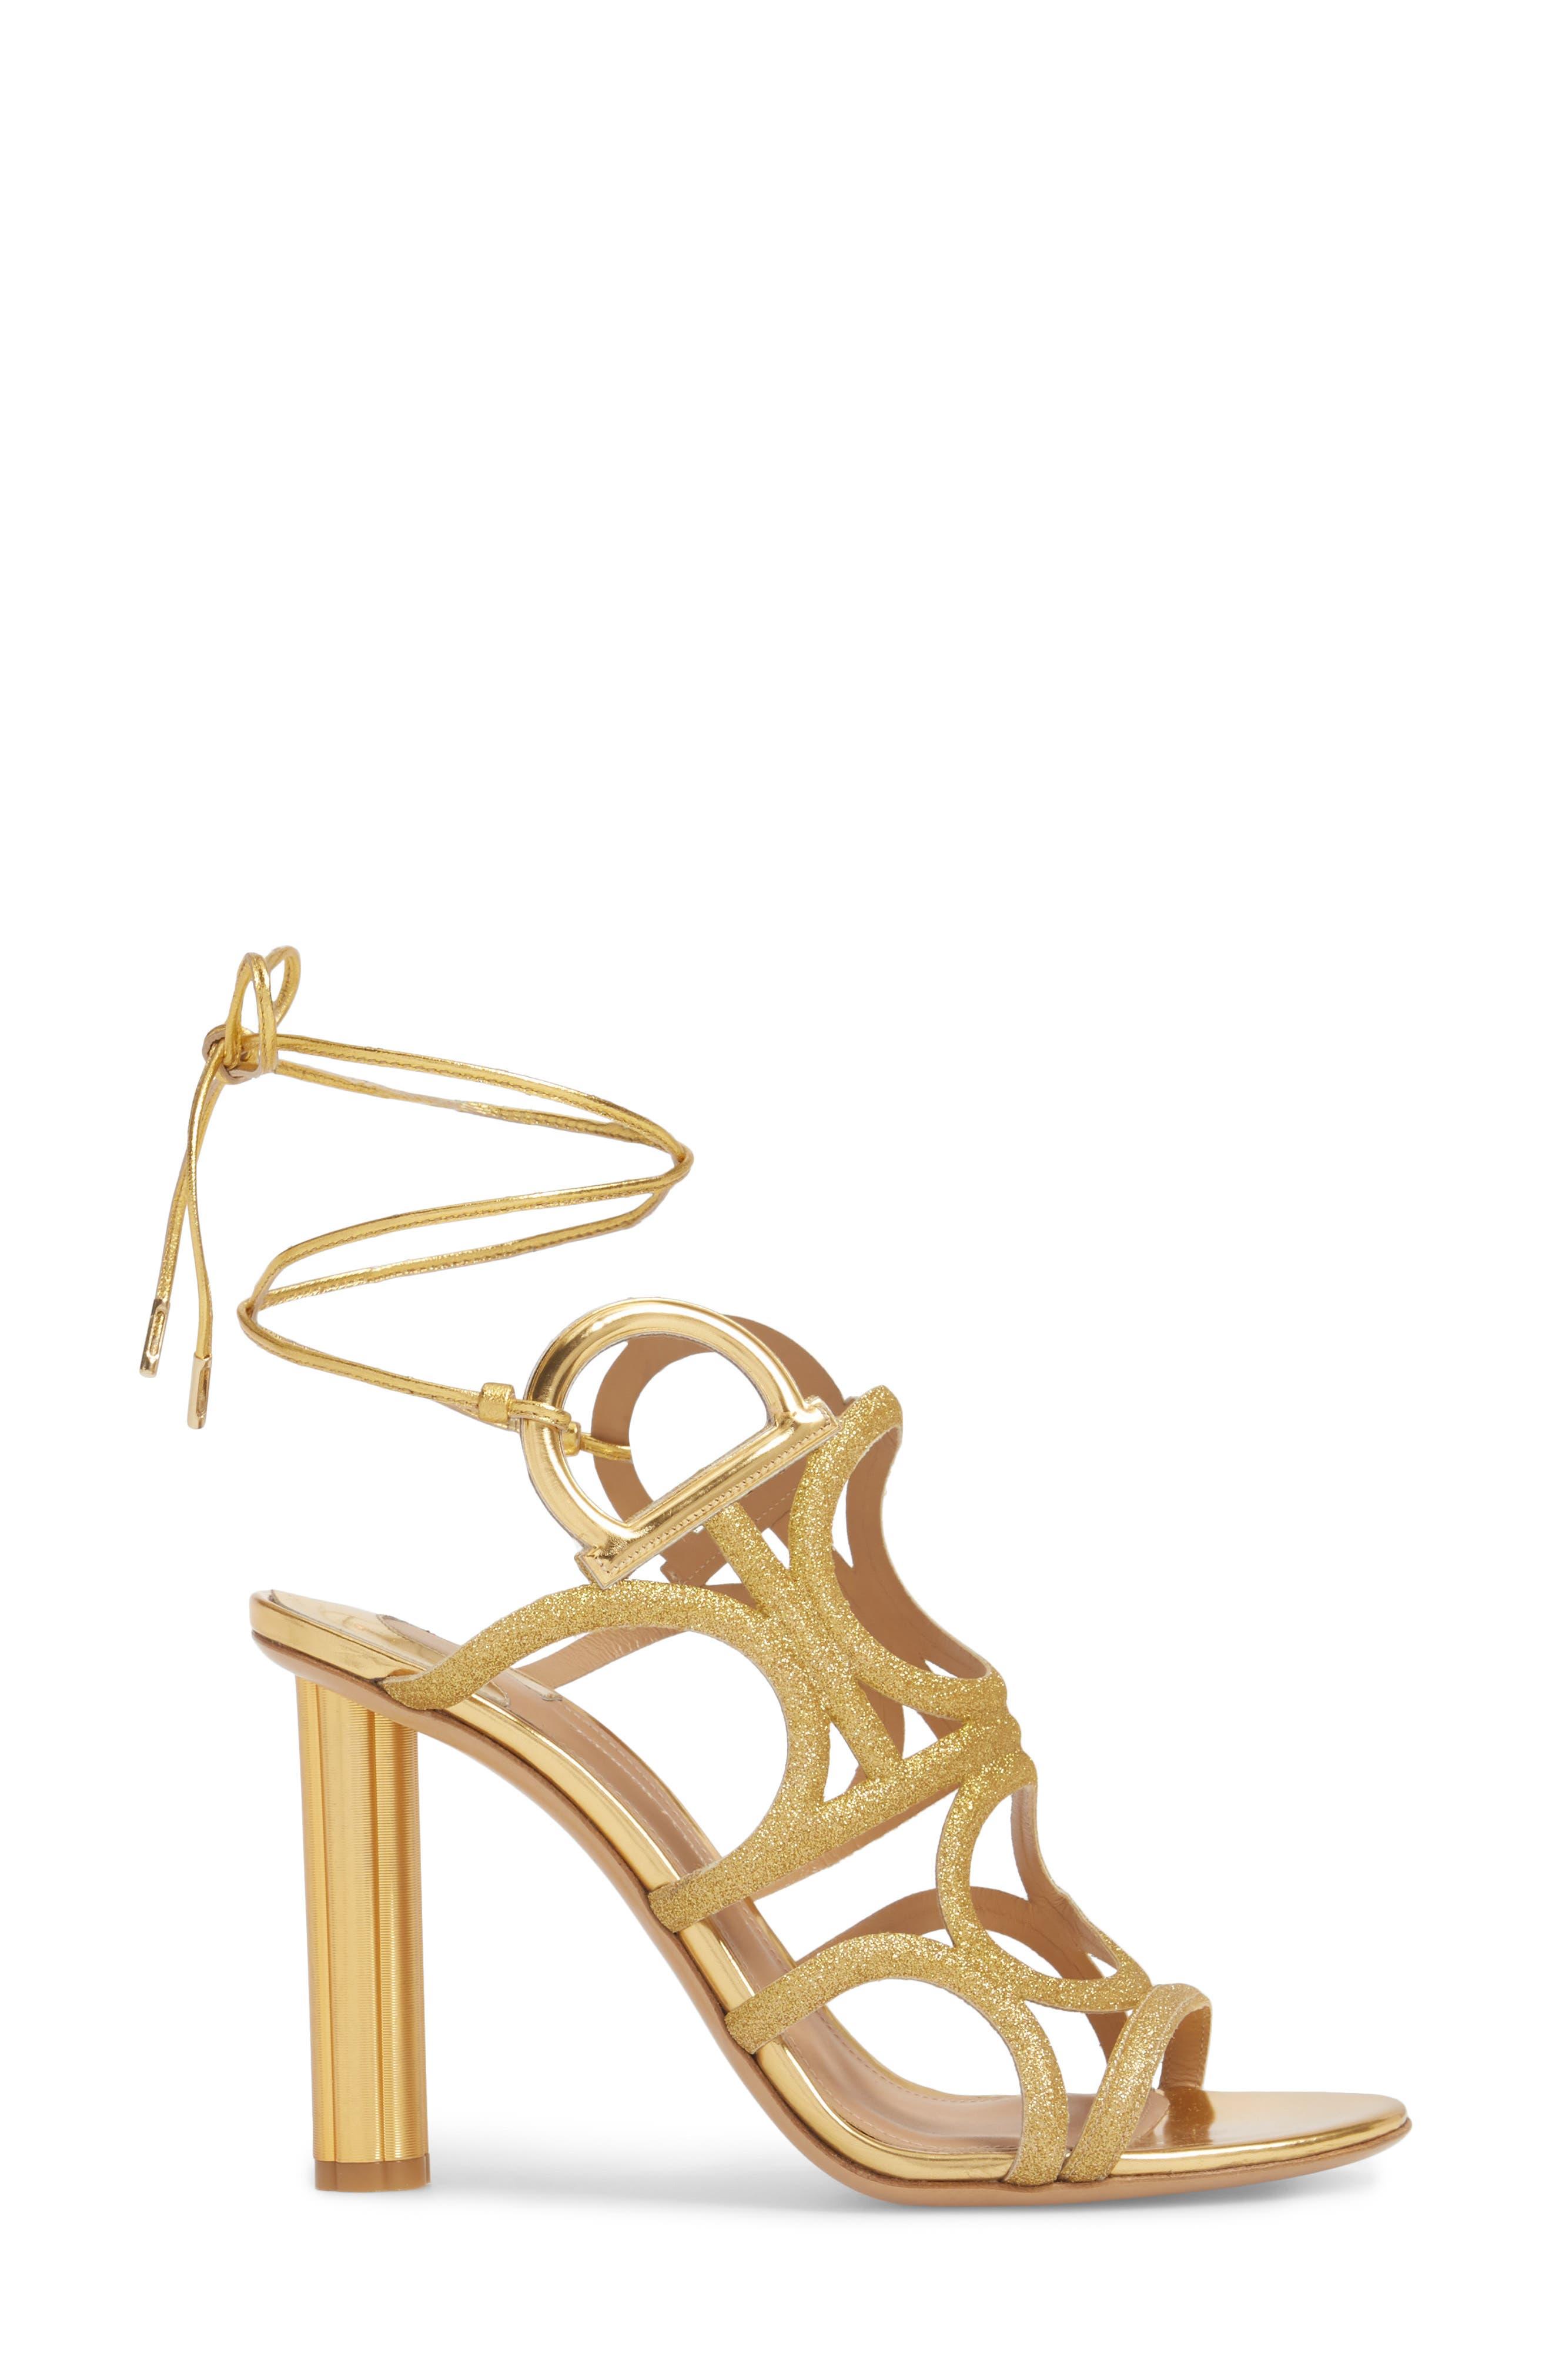 Vinci Lace-Up Heeled Sandal,                             Alternate thumbnail 3, color,                             710